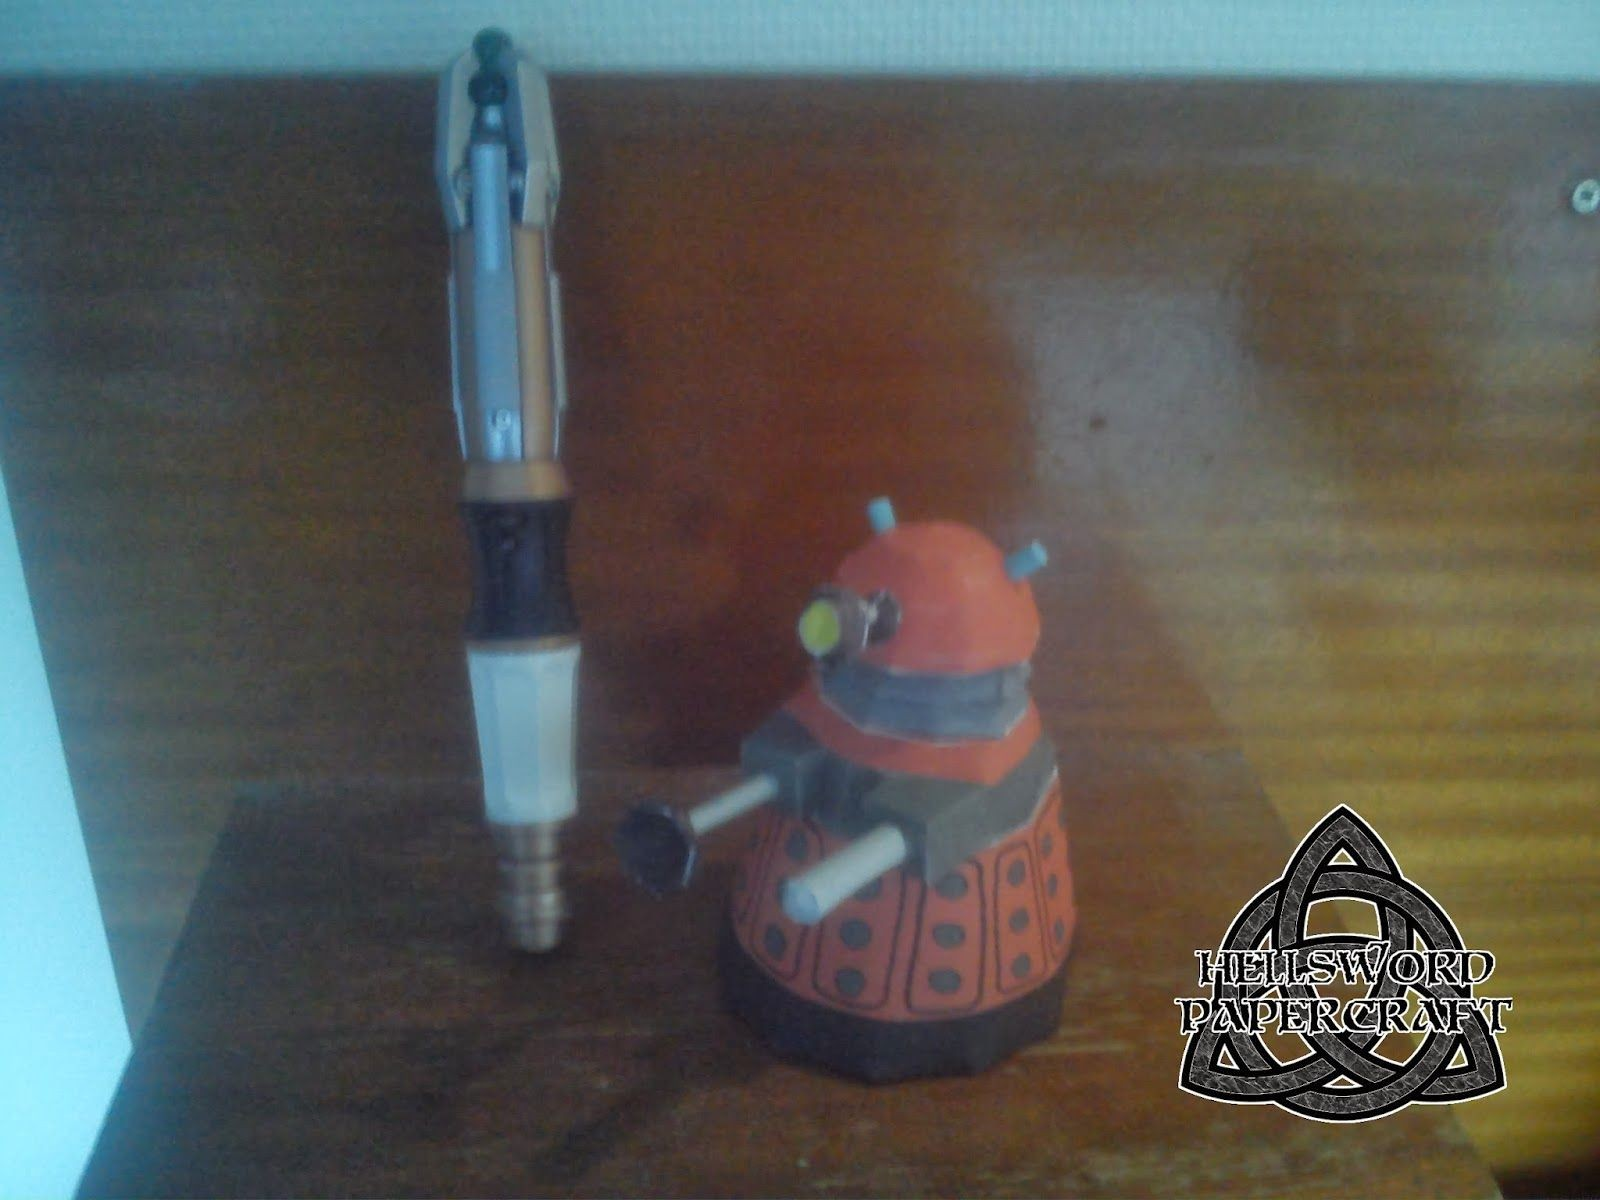 Papercraft Dalek Doctor who Universe] Dalek V2 Chibi Docteur whoo